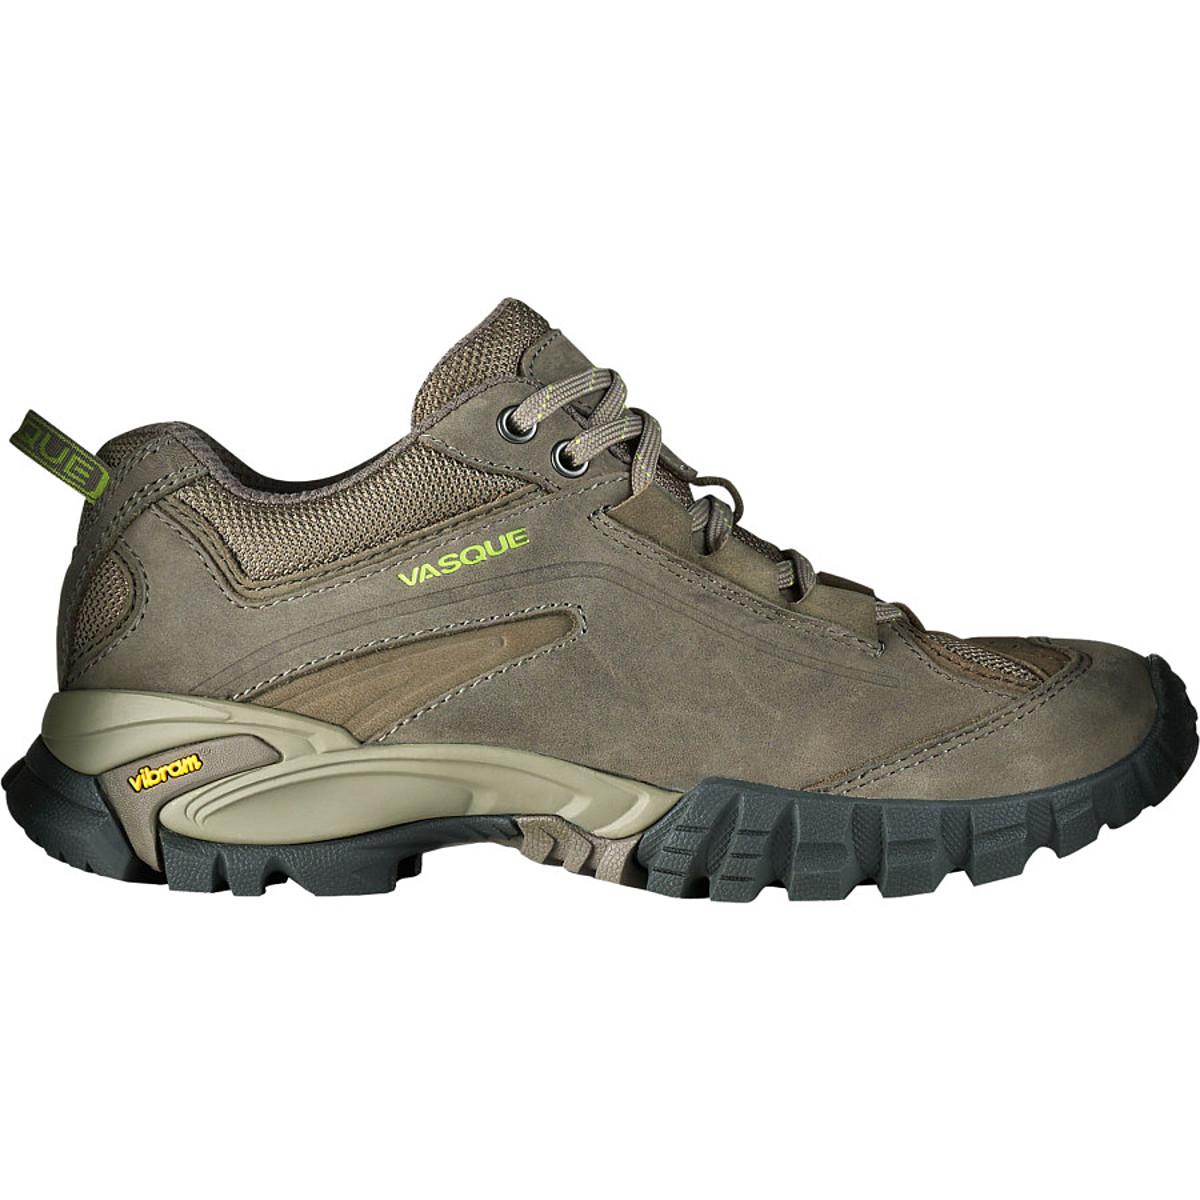 photo: Vasque Women's Mantra 2.0 trail shoe